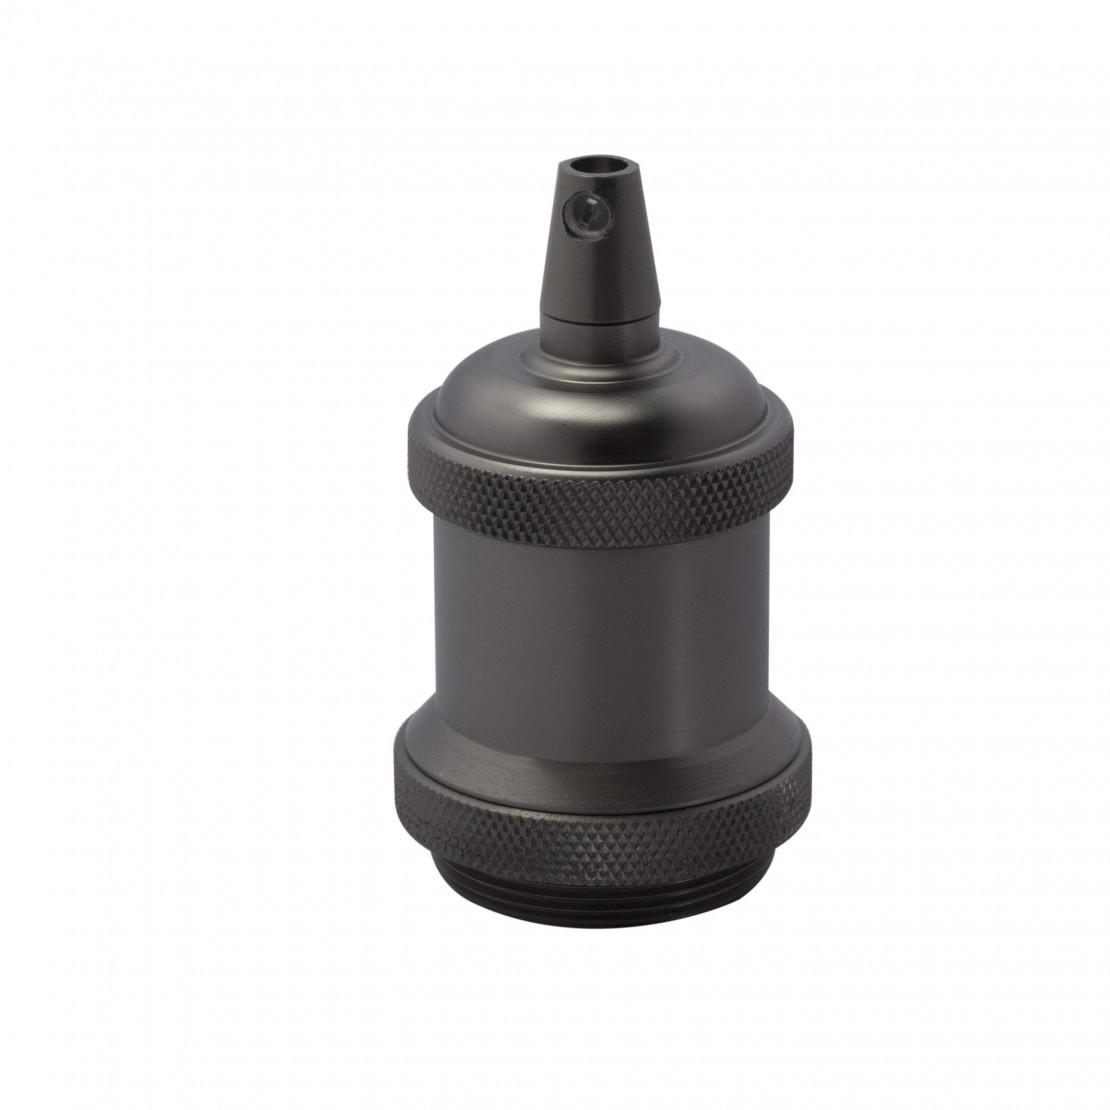 Metalen lamphouder-titanium